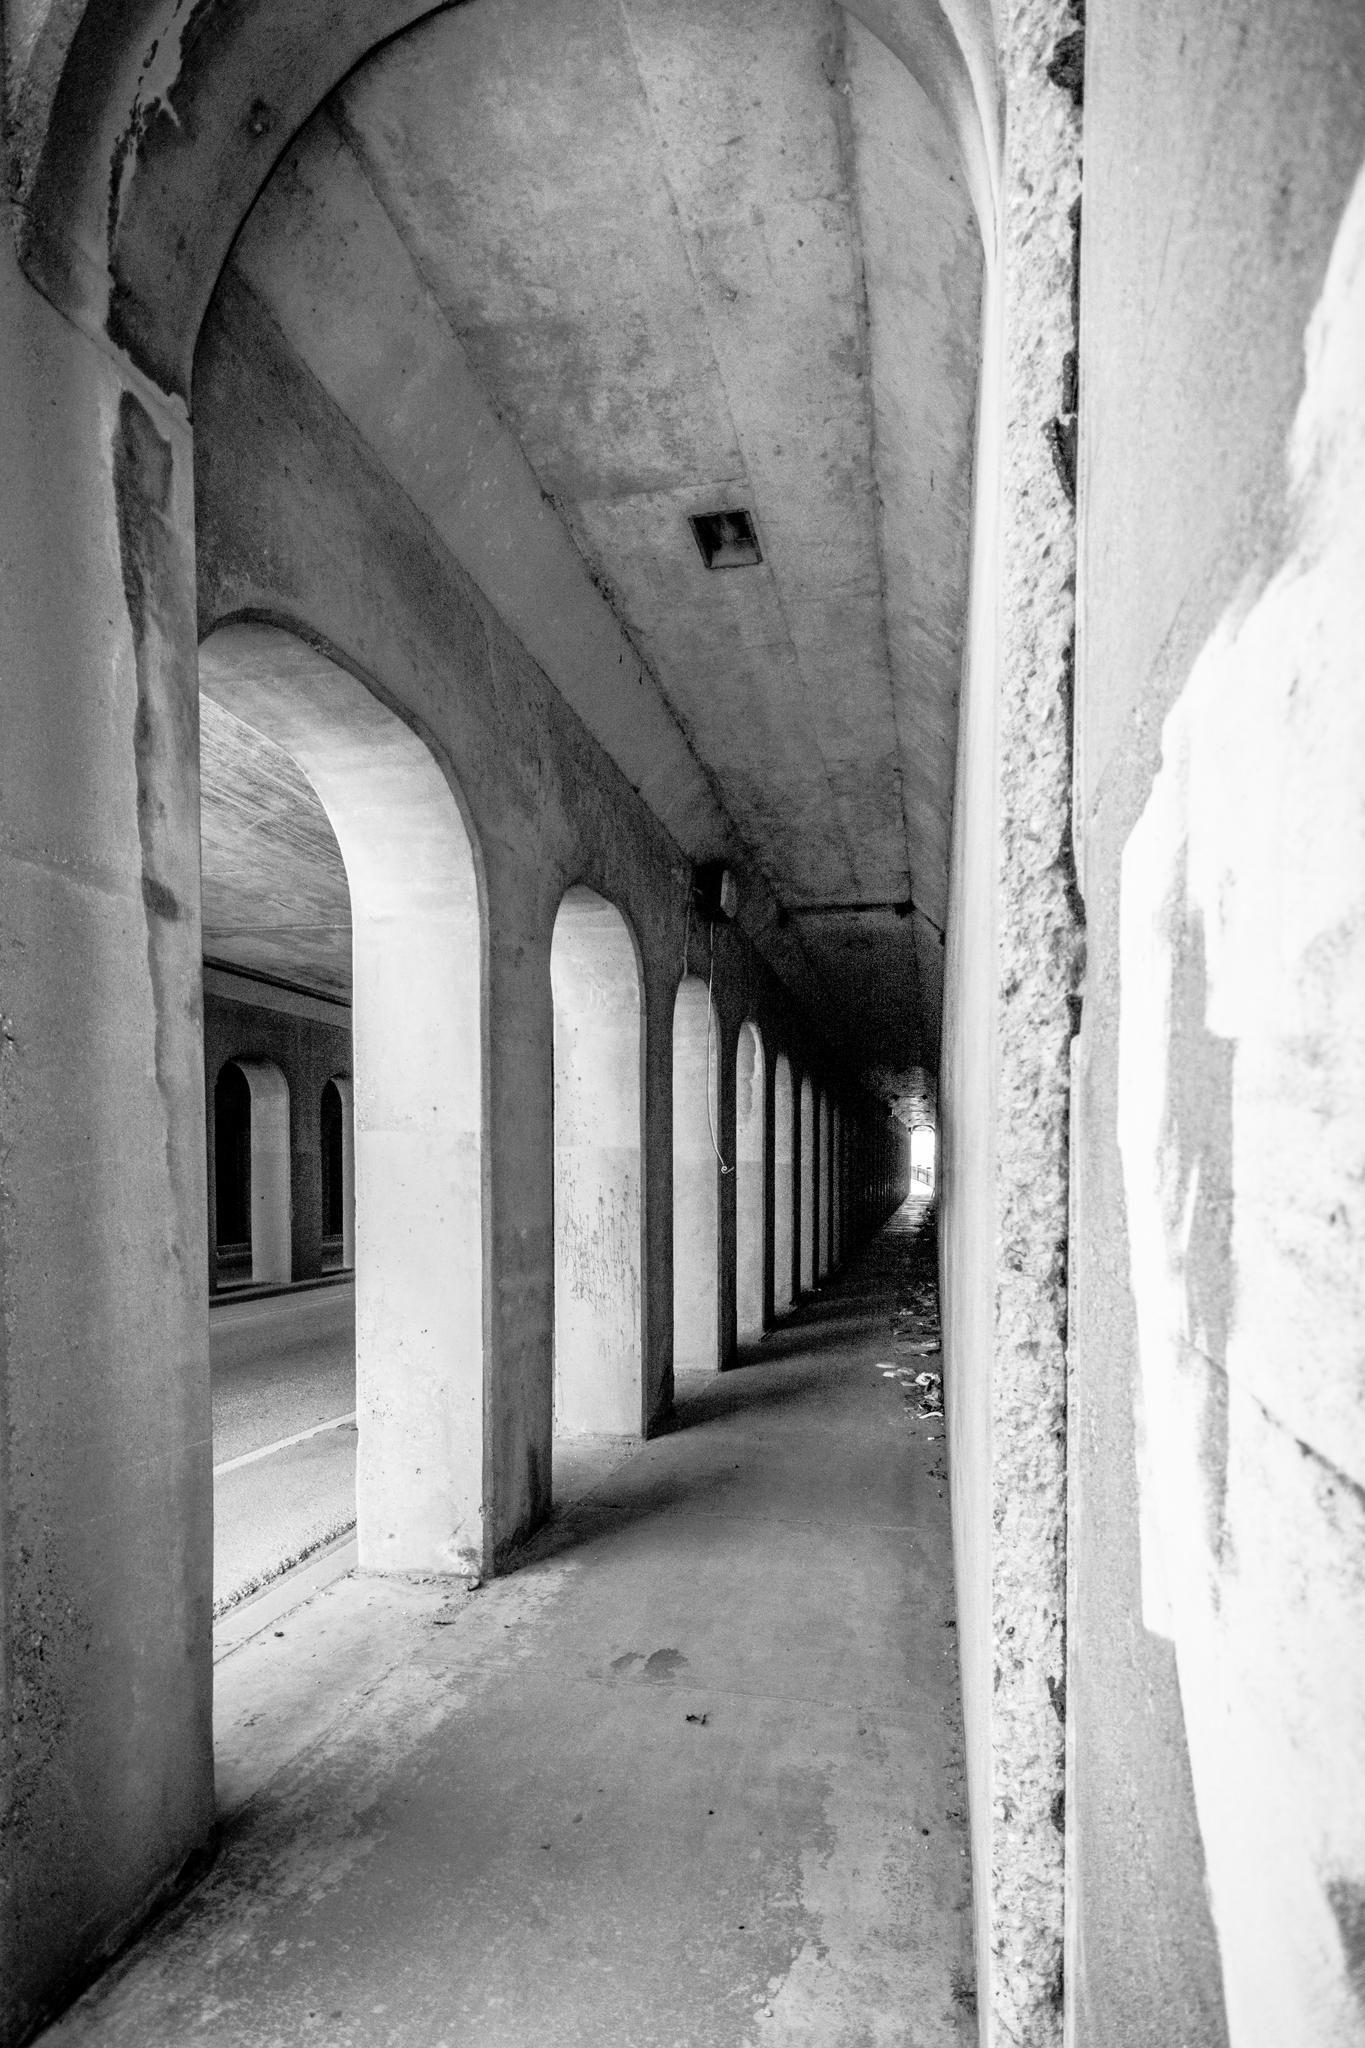 Homeless Hotel By Brad Clawson 500px Hotel Clawson Homeless